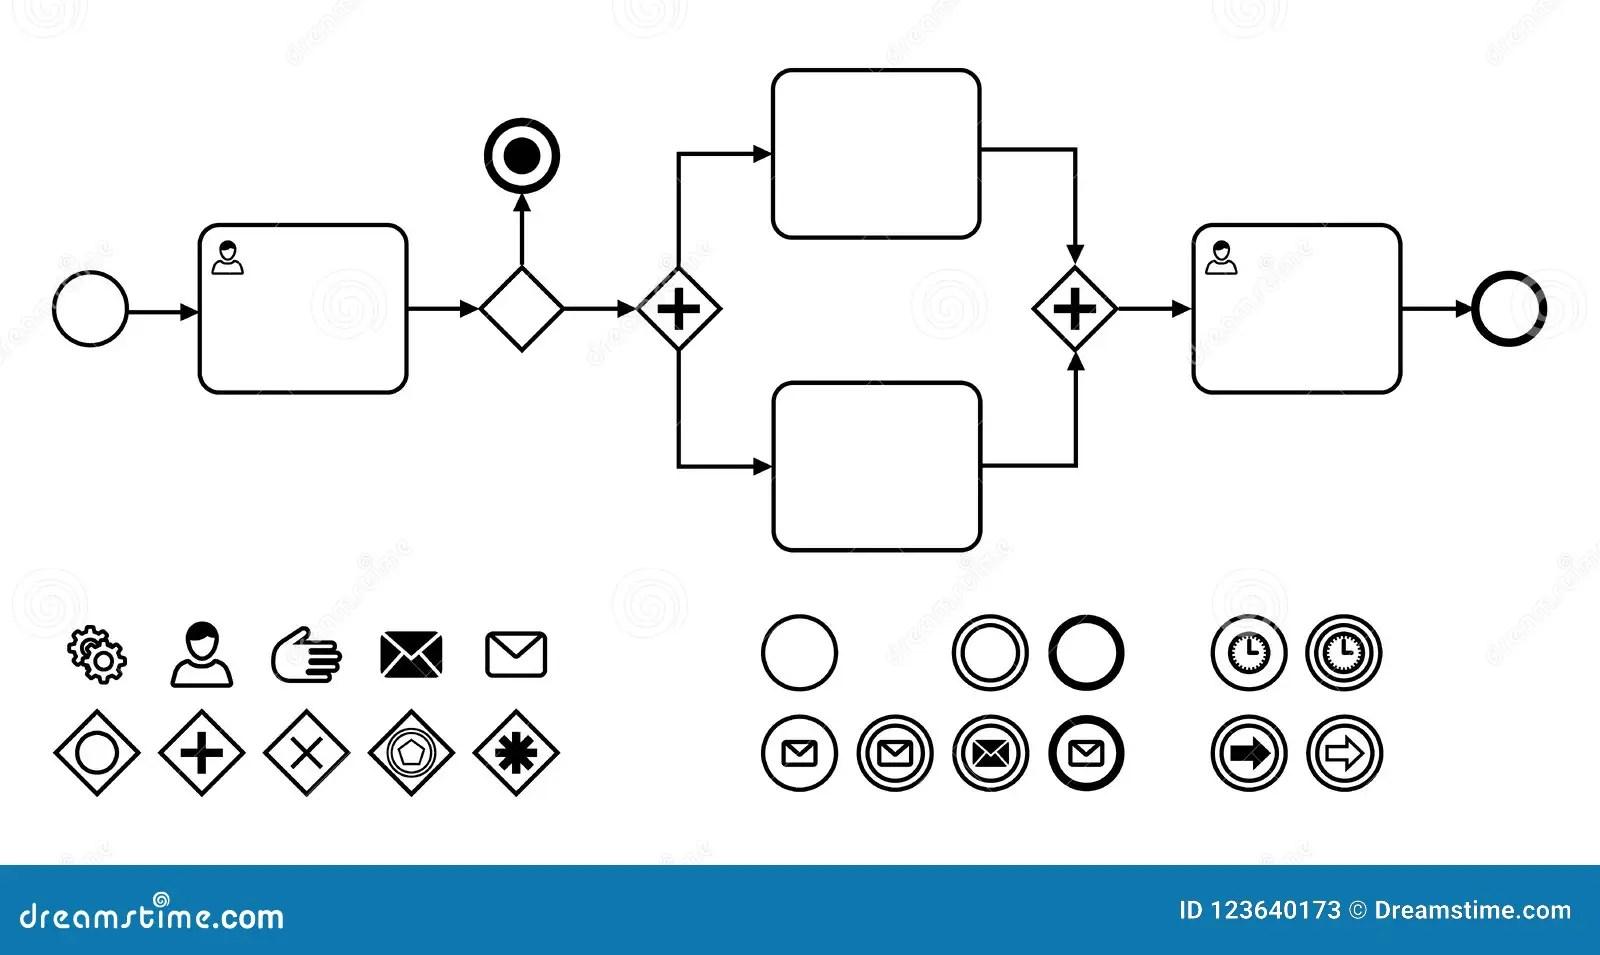 Symbols For Process Flow Diagrams